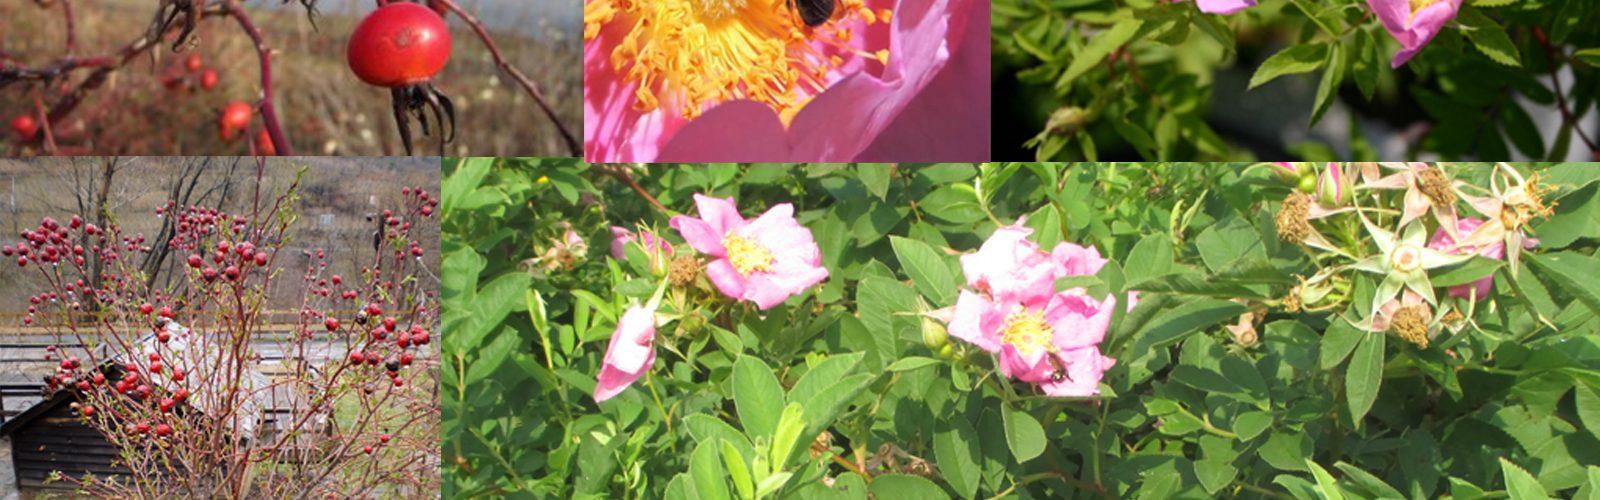 Genus Spotlight: The Native Roses